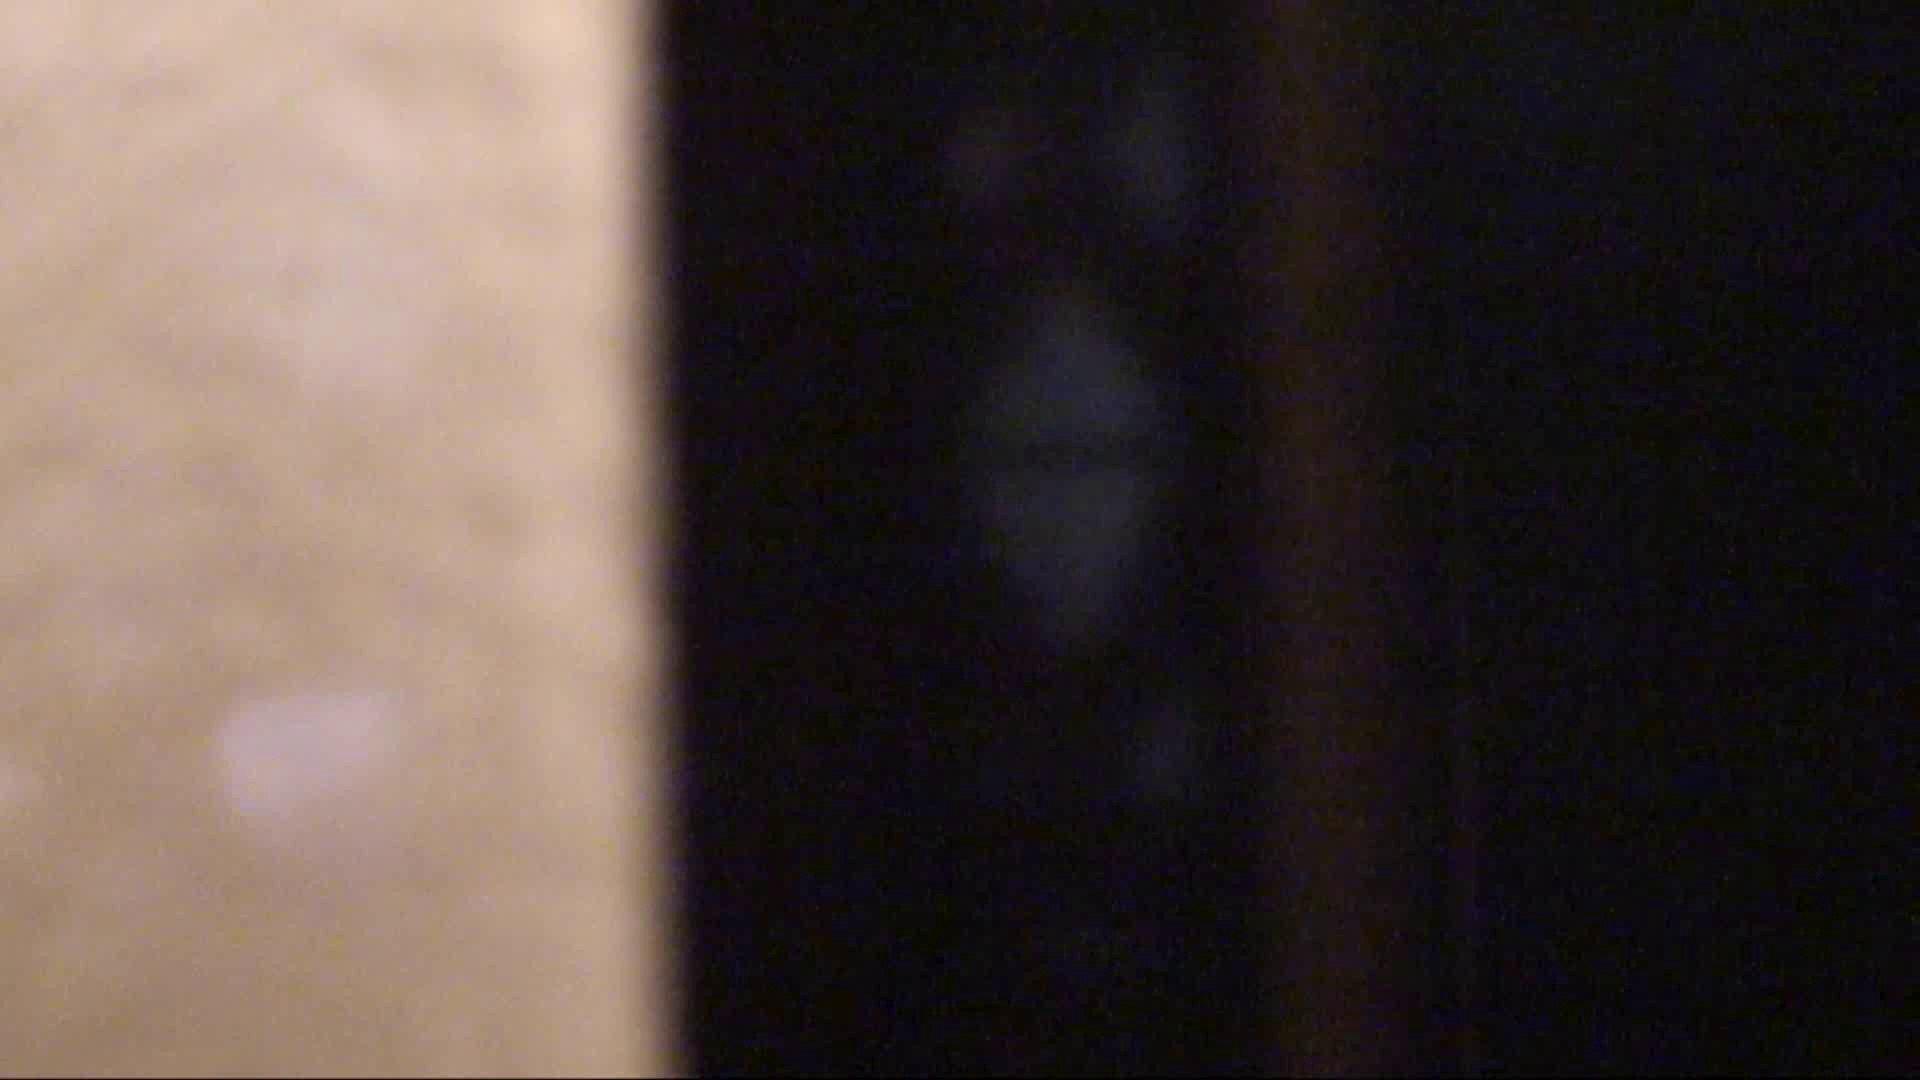 vol.01必見!白肌嬢の乳首が丸見え。極上美人のすっぴん顔をハイビジョンで! 乳首 オメコ動画キャプチャ 89pic 11